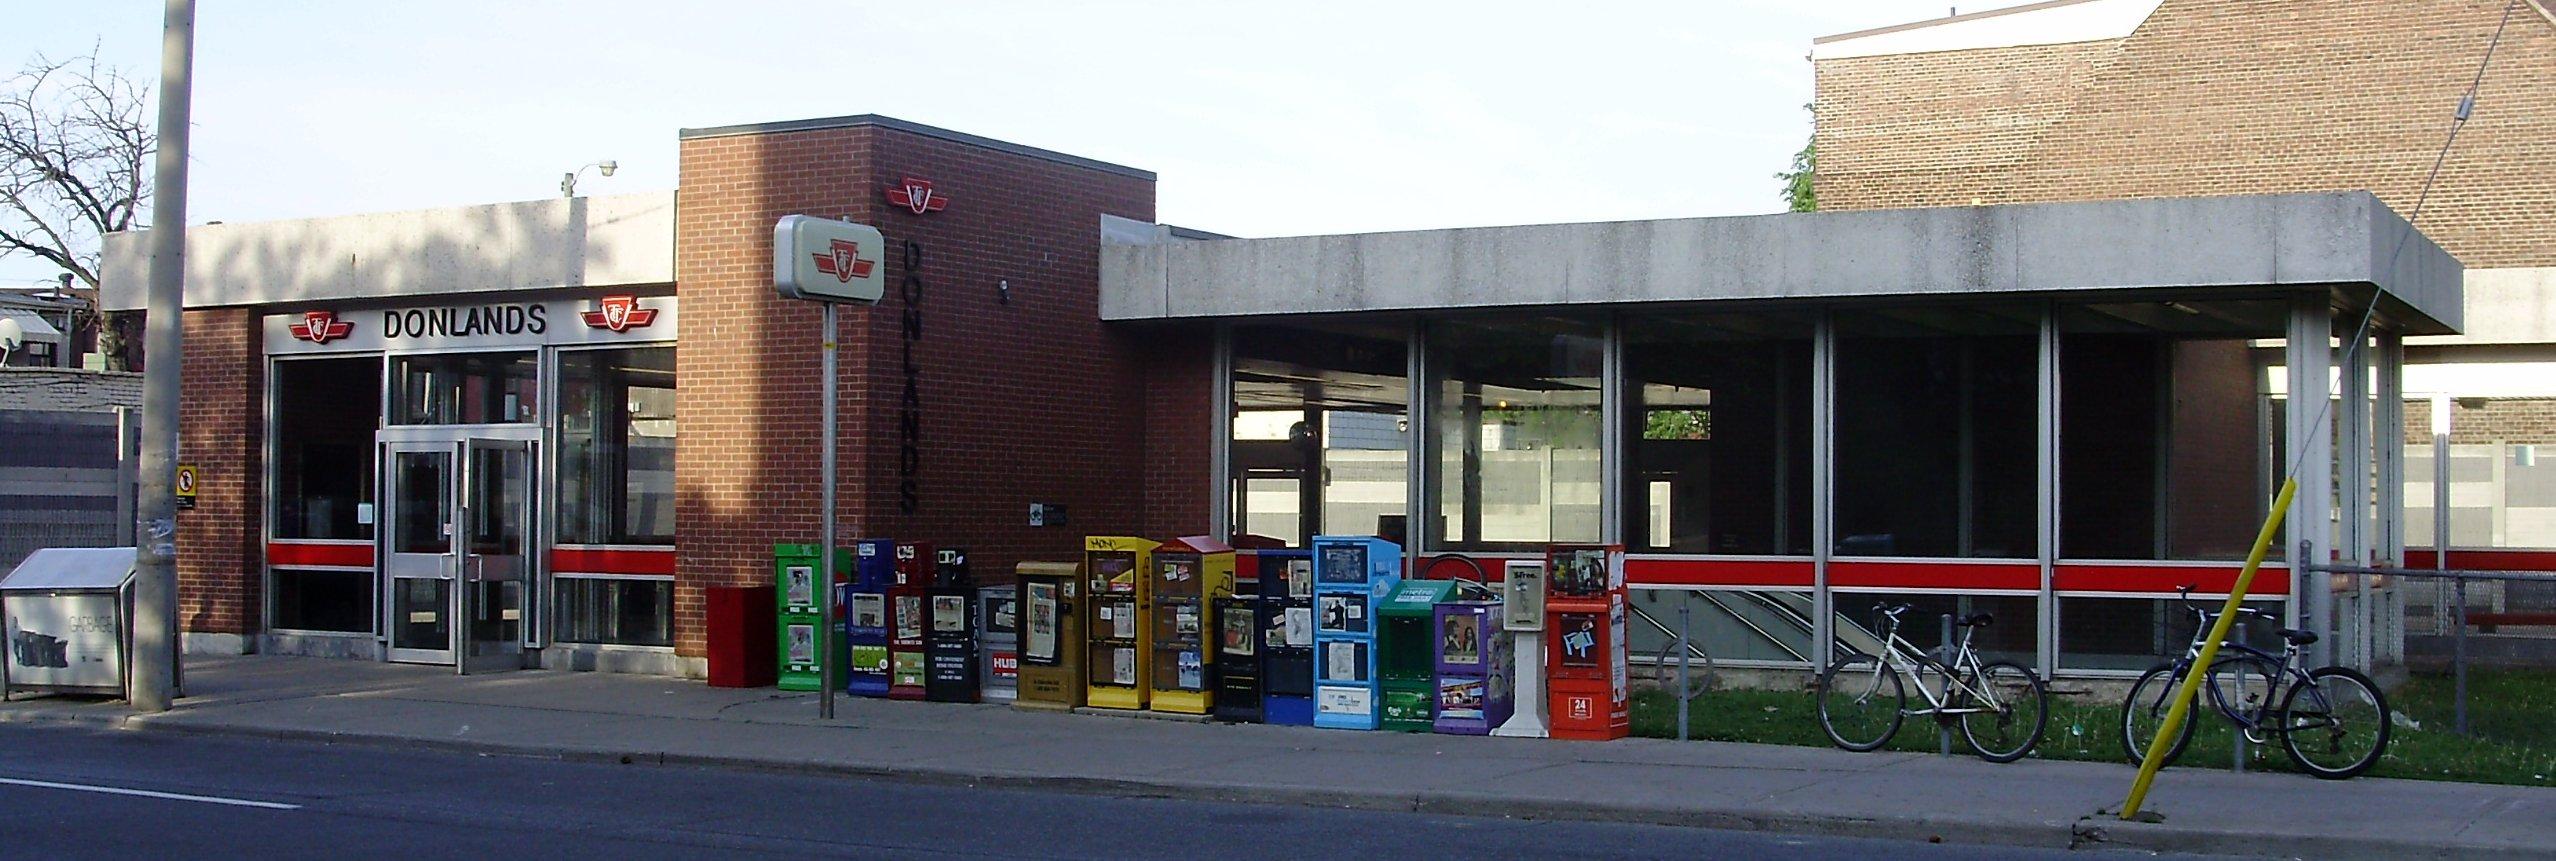 File Donlands Station Ttc Jpg Wikimedia Commons